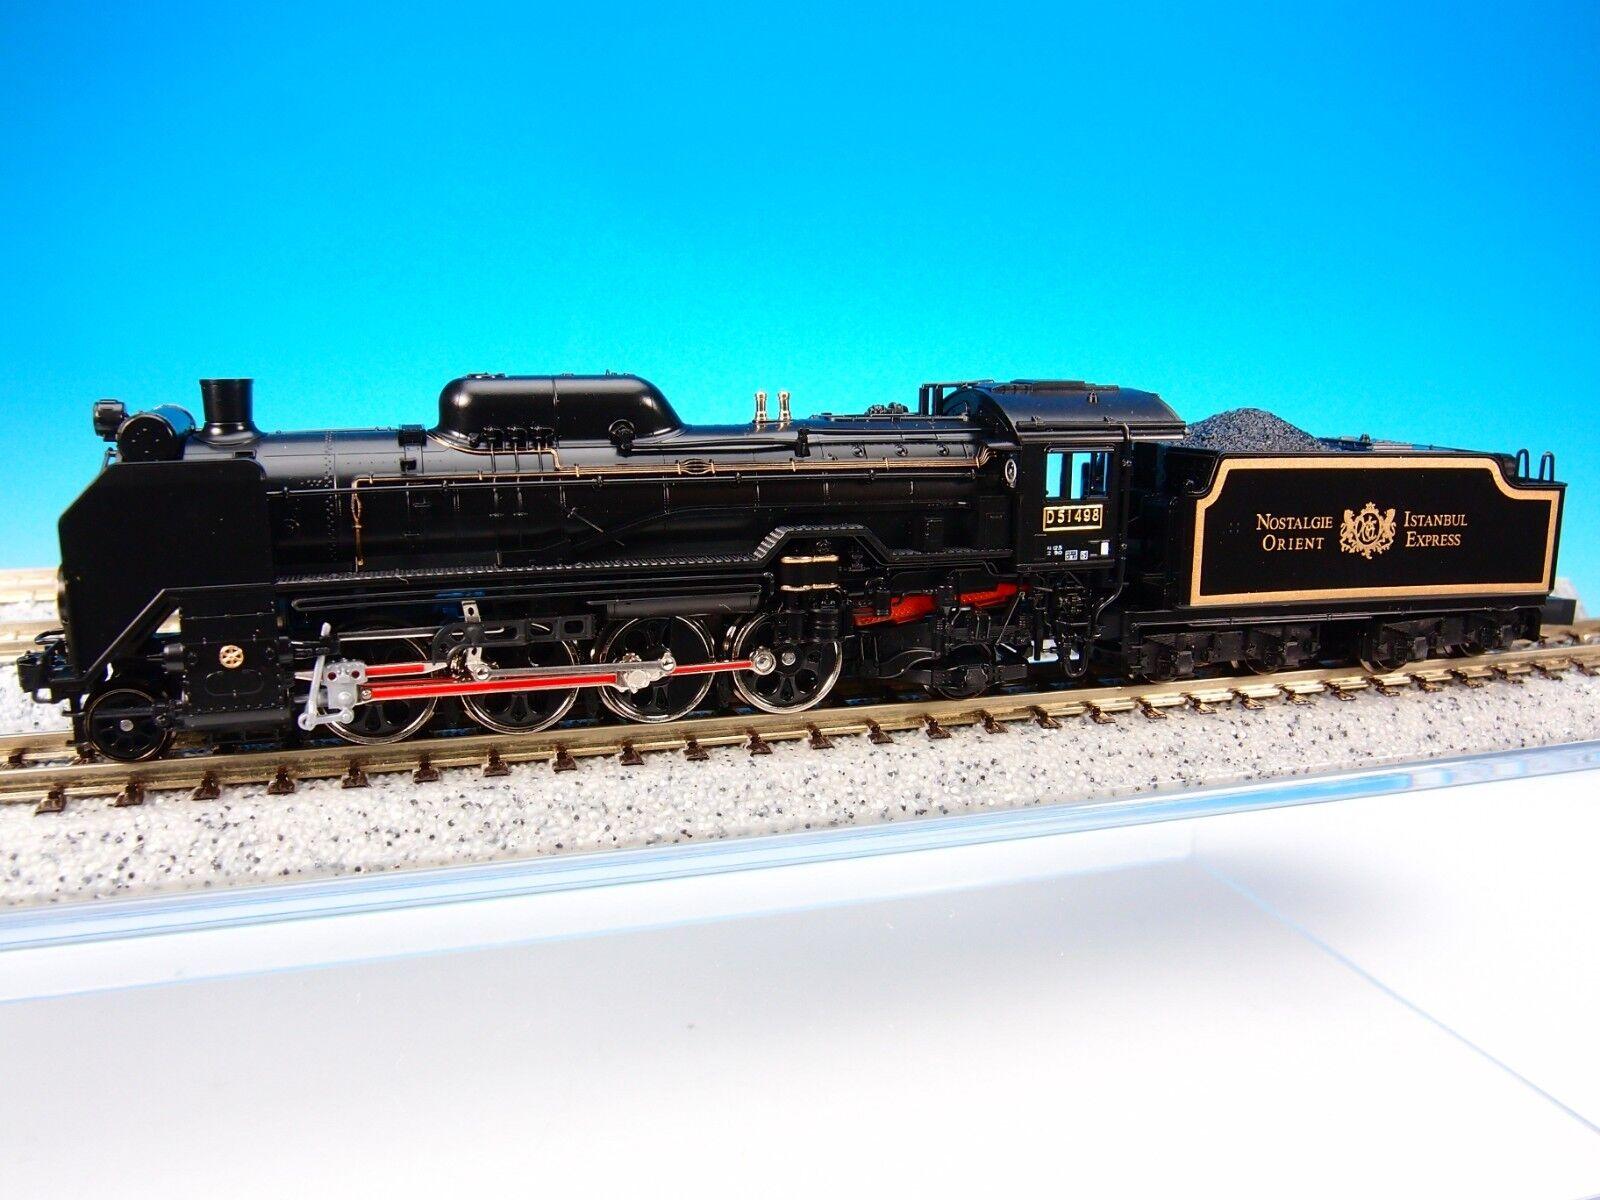 con 60% de descuento KATO 2018-2 JNR Steam Locomotive Type D51-498 Orient Express '88 '88 '88 (N Scale) New  mas barato